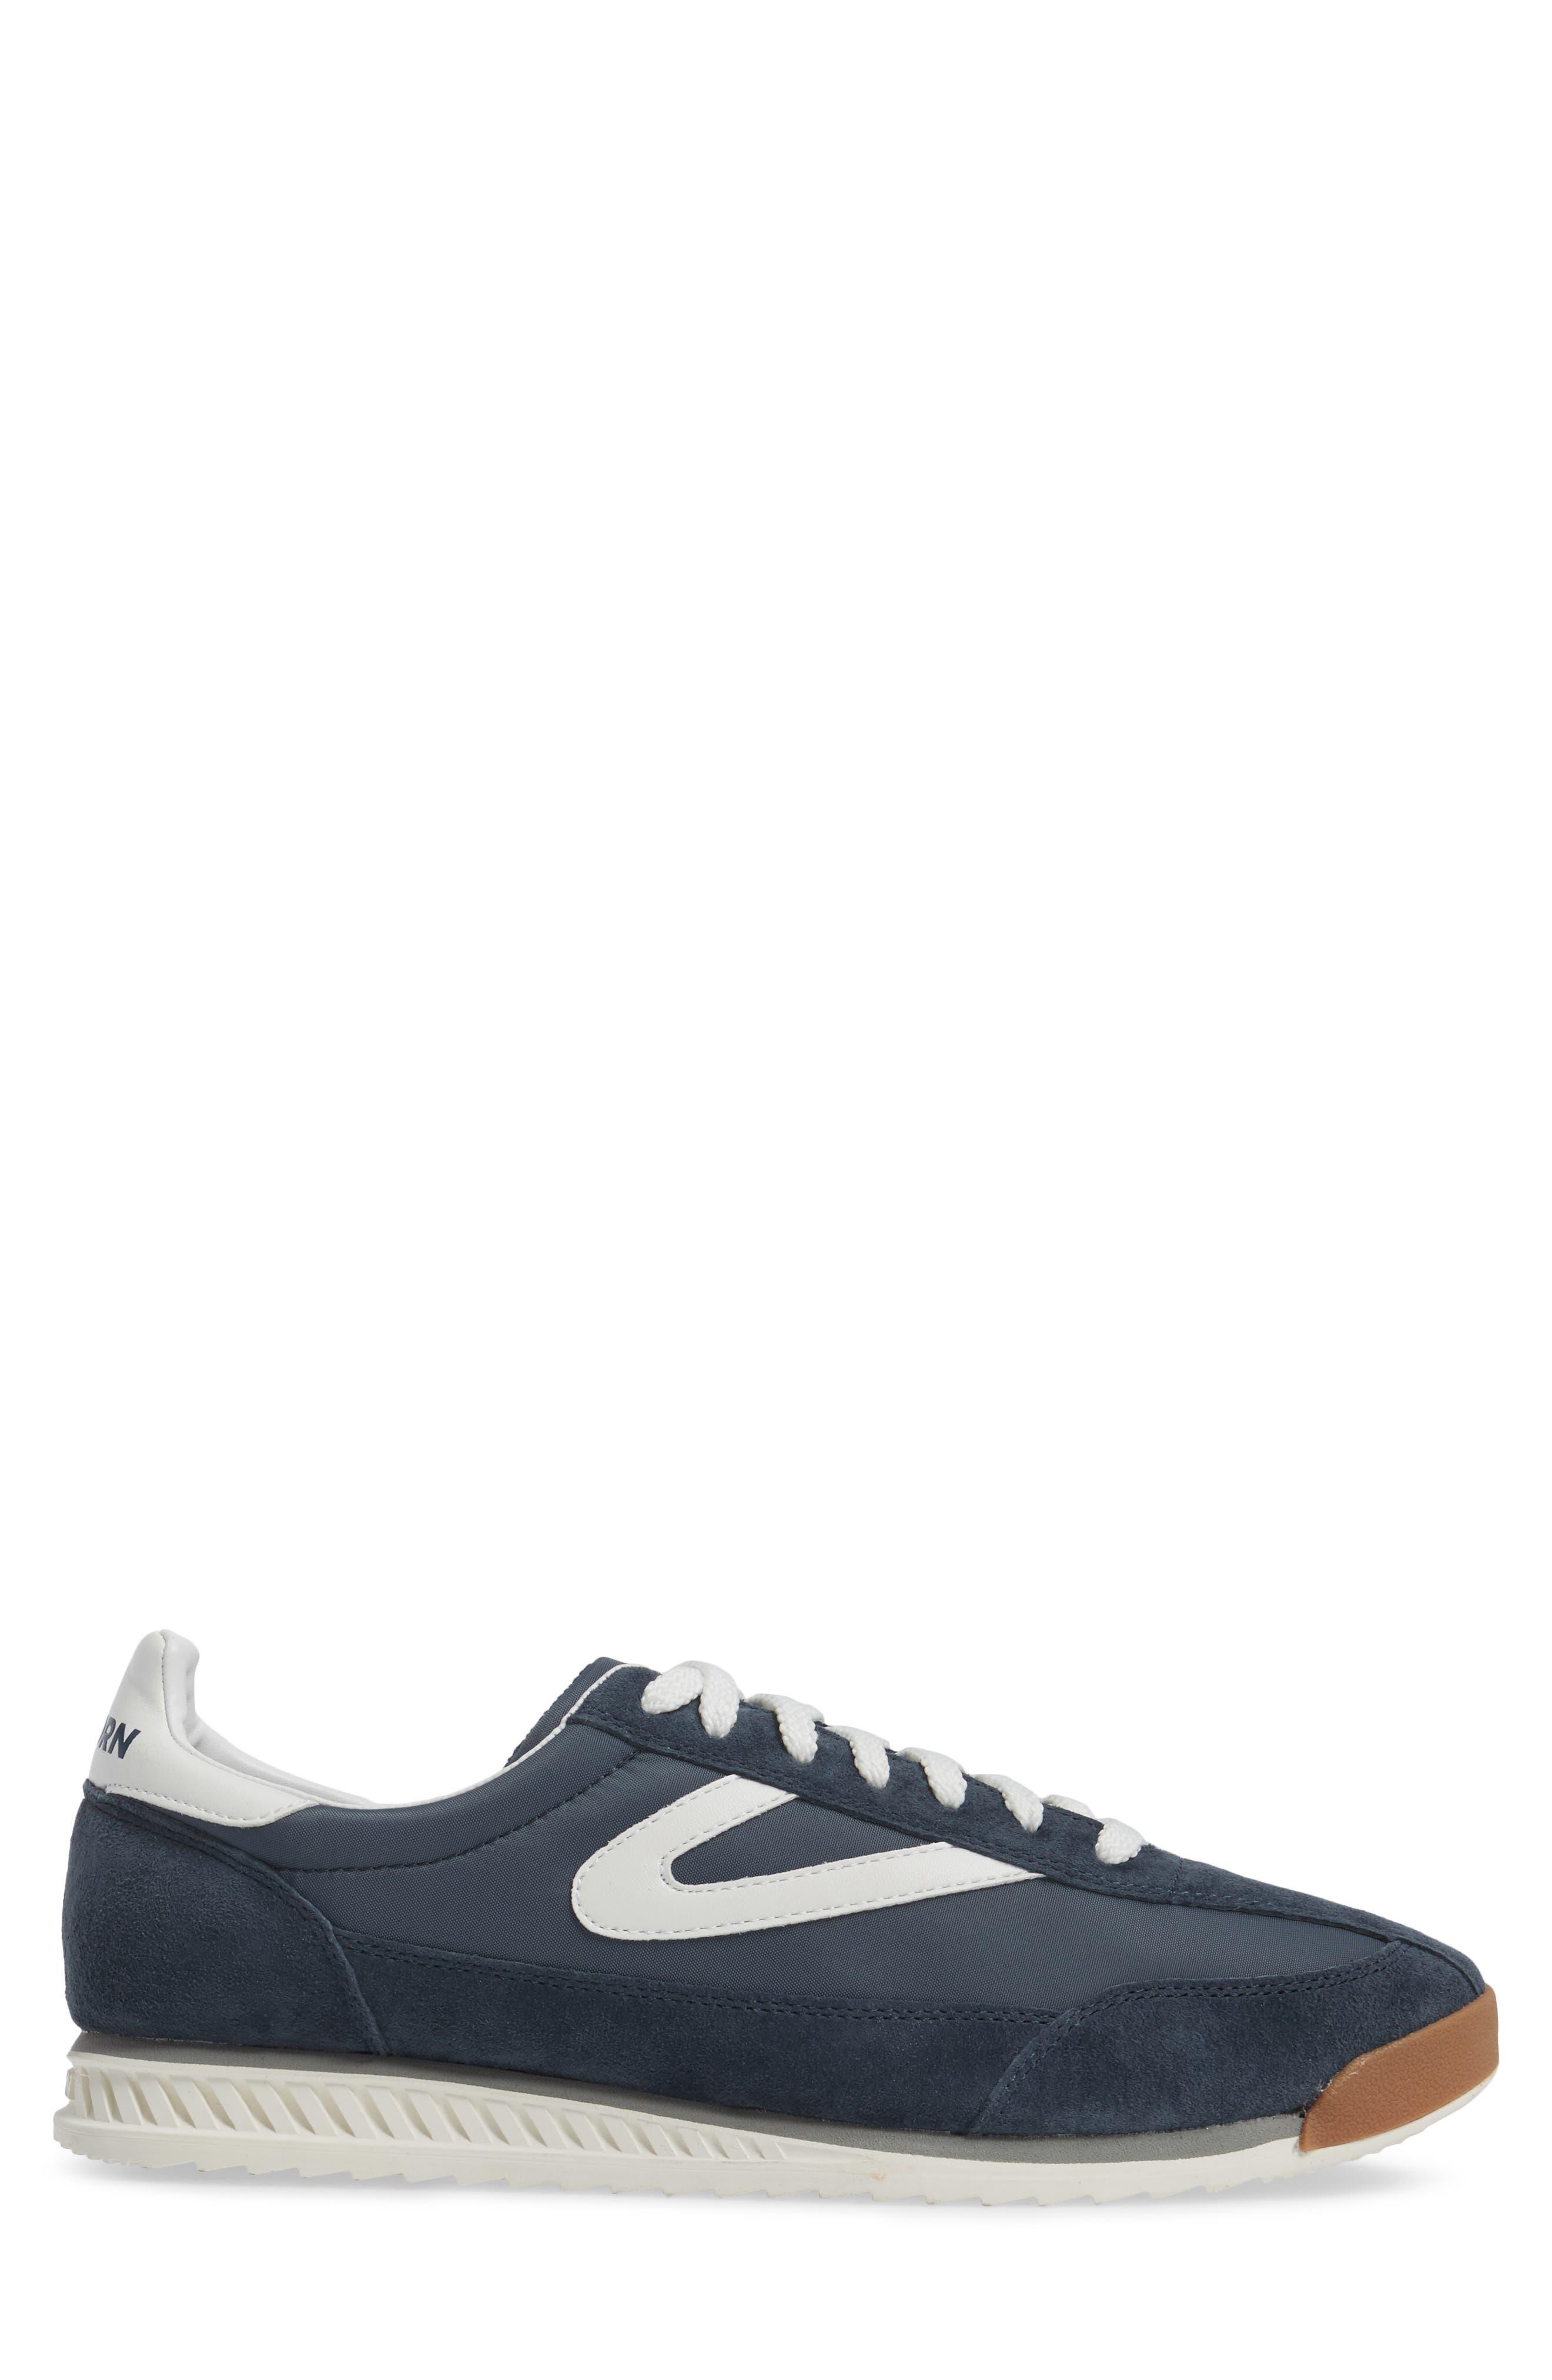 Rawlins 3 Sneaker,                             Alternate thumbnail 3, color,                             Blue/ Blue/ White